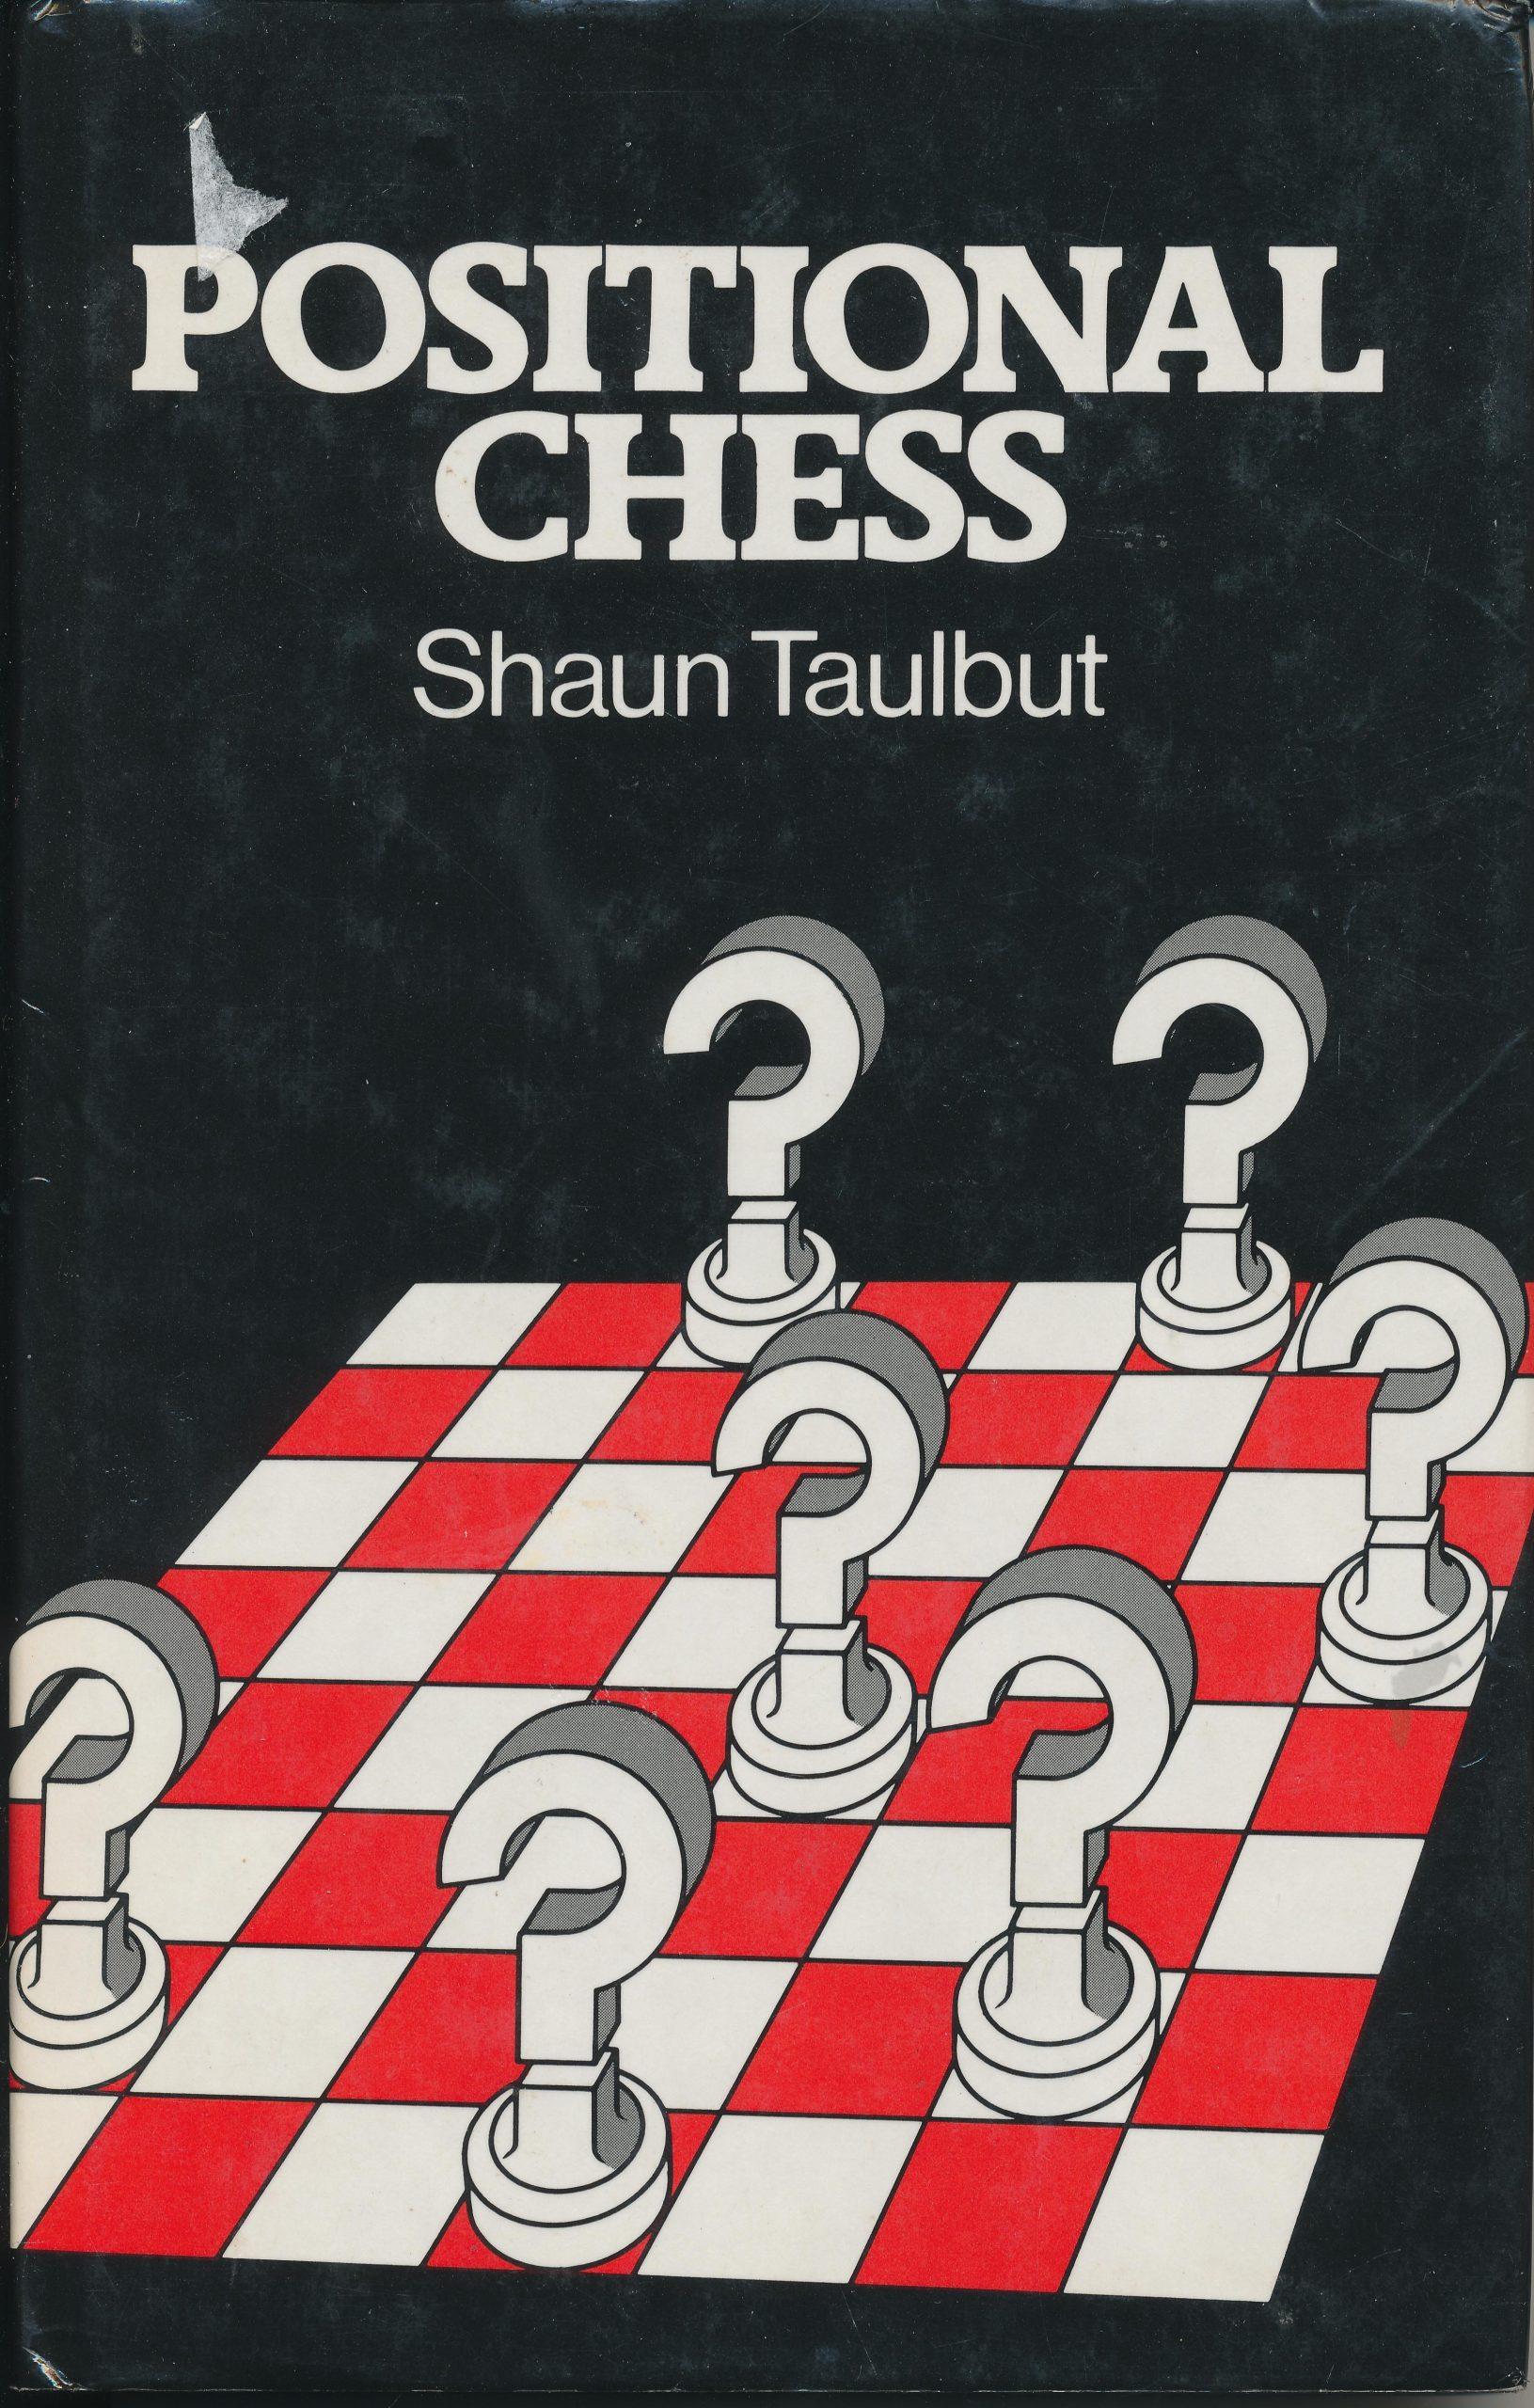 Positional Chess, Shaun Taulbut, George Allen & Unwin, 1983, ISBN 0 04 794017 4